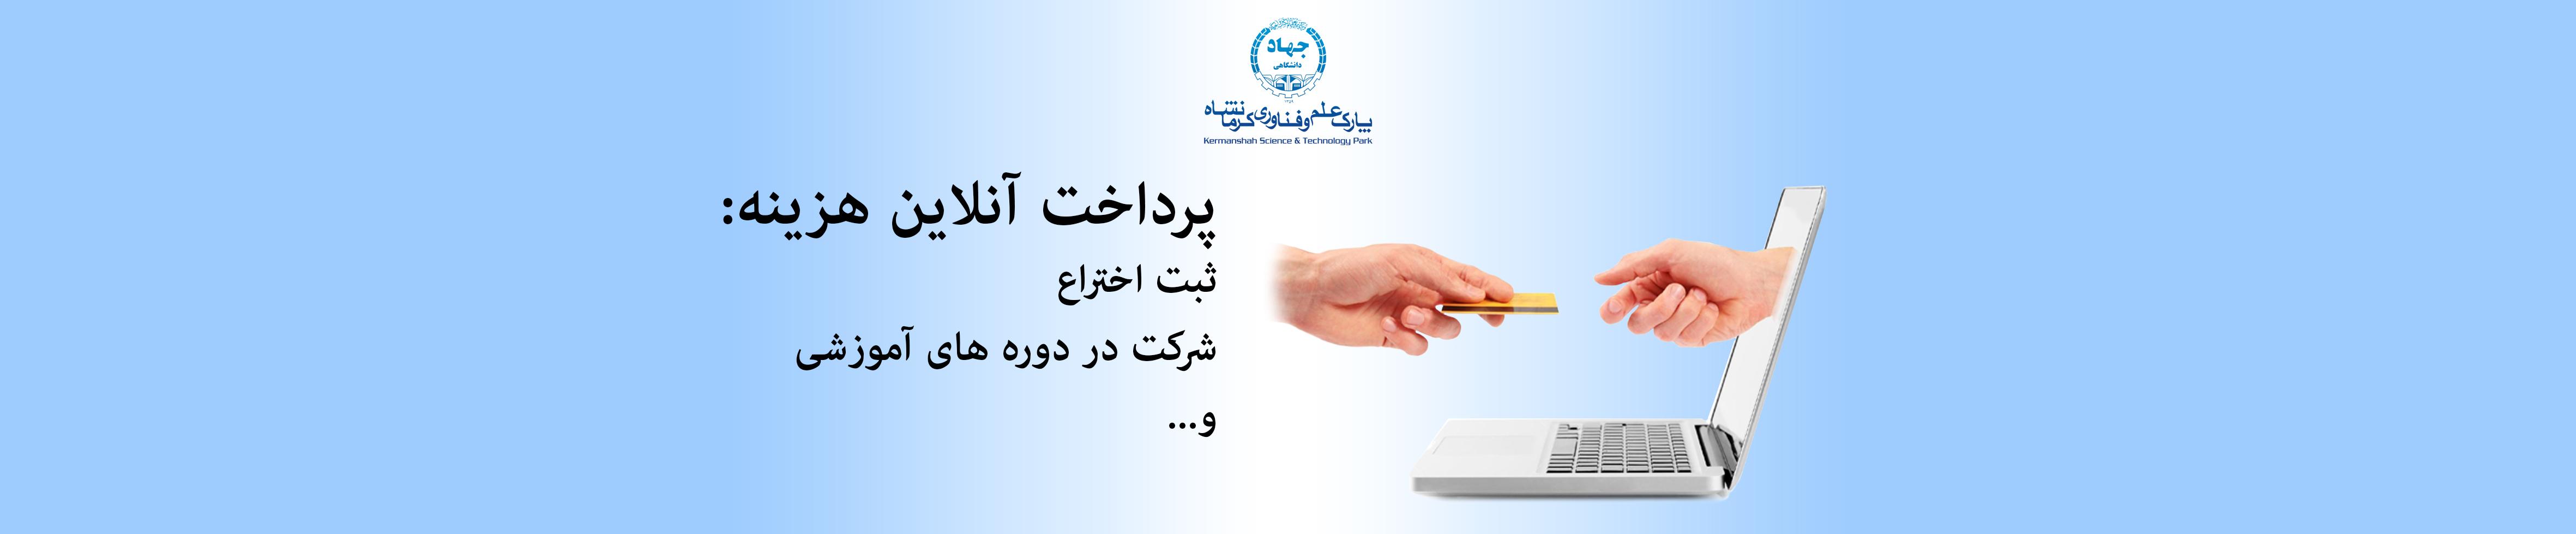 sabtekhtera